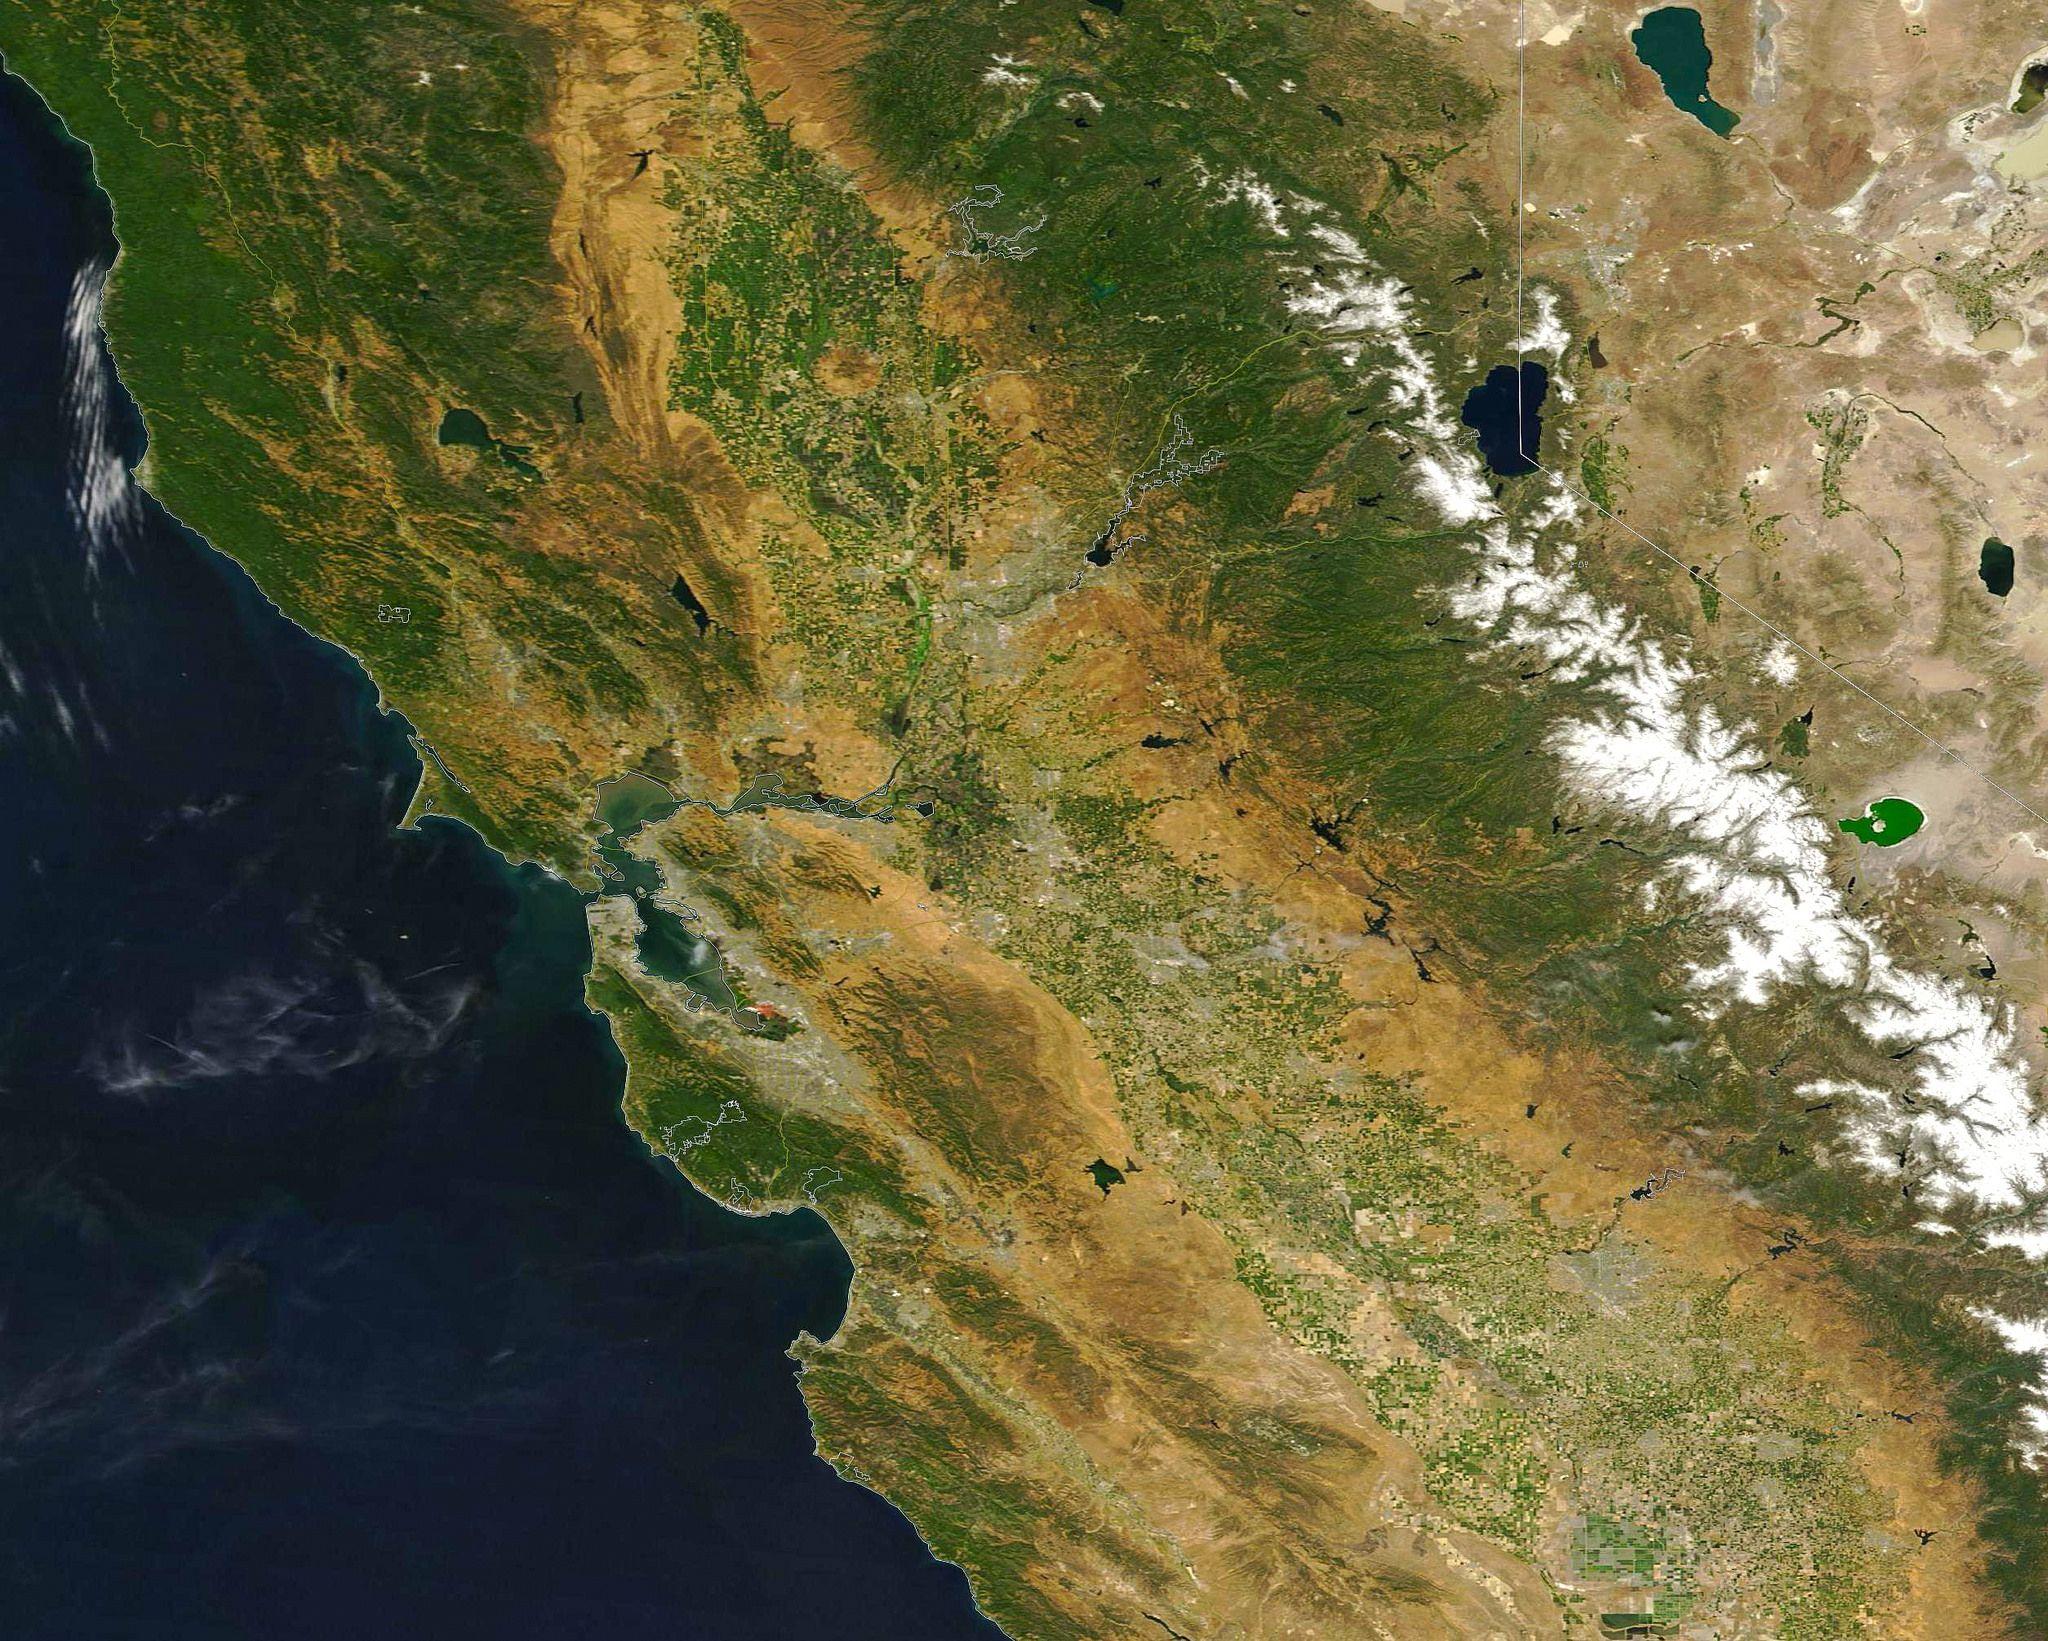 California Quake Map Usgs%0A https   flic kr p WirGTG   Central California in the